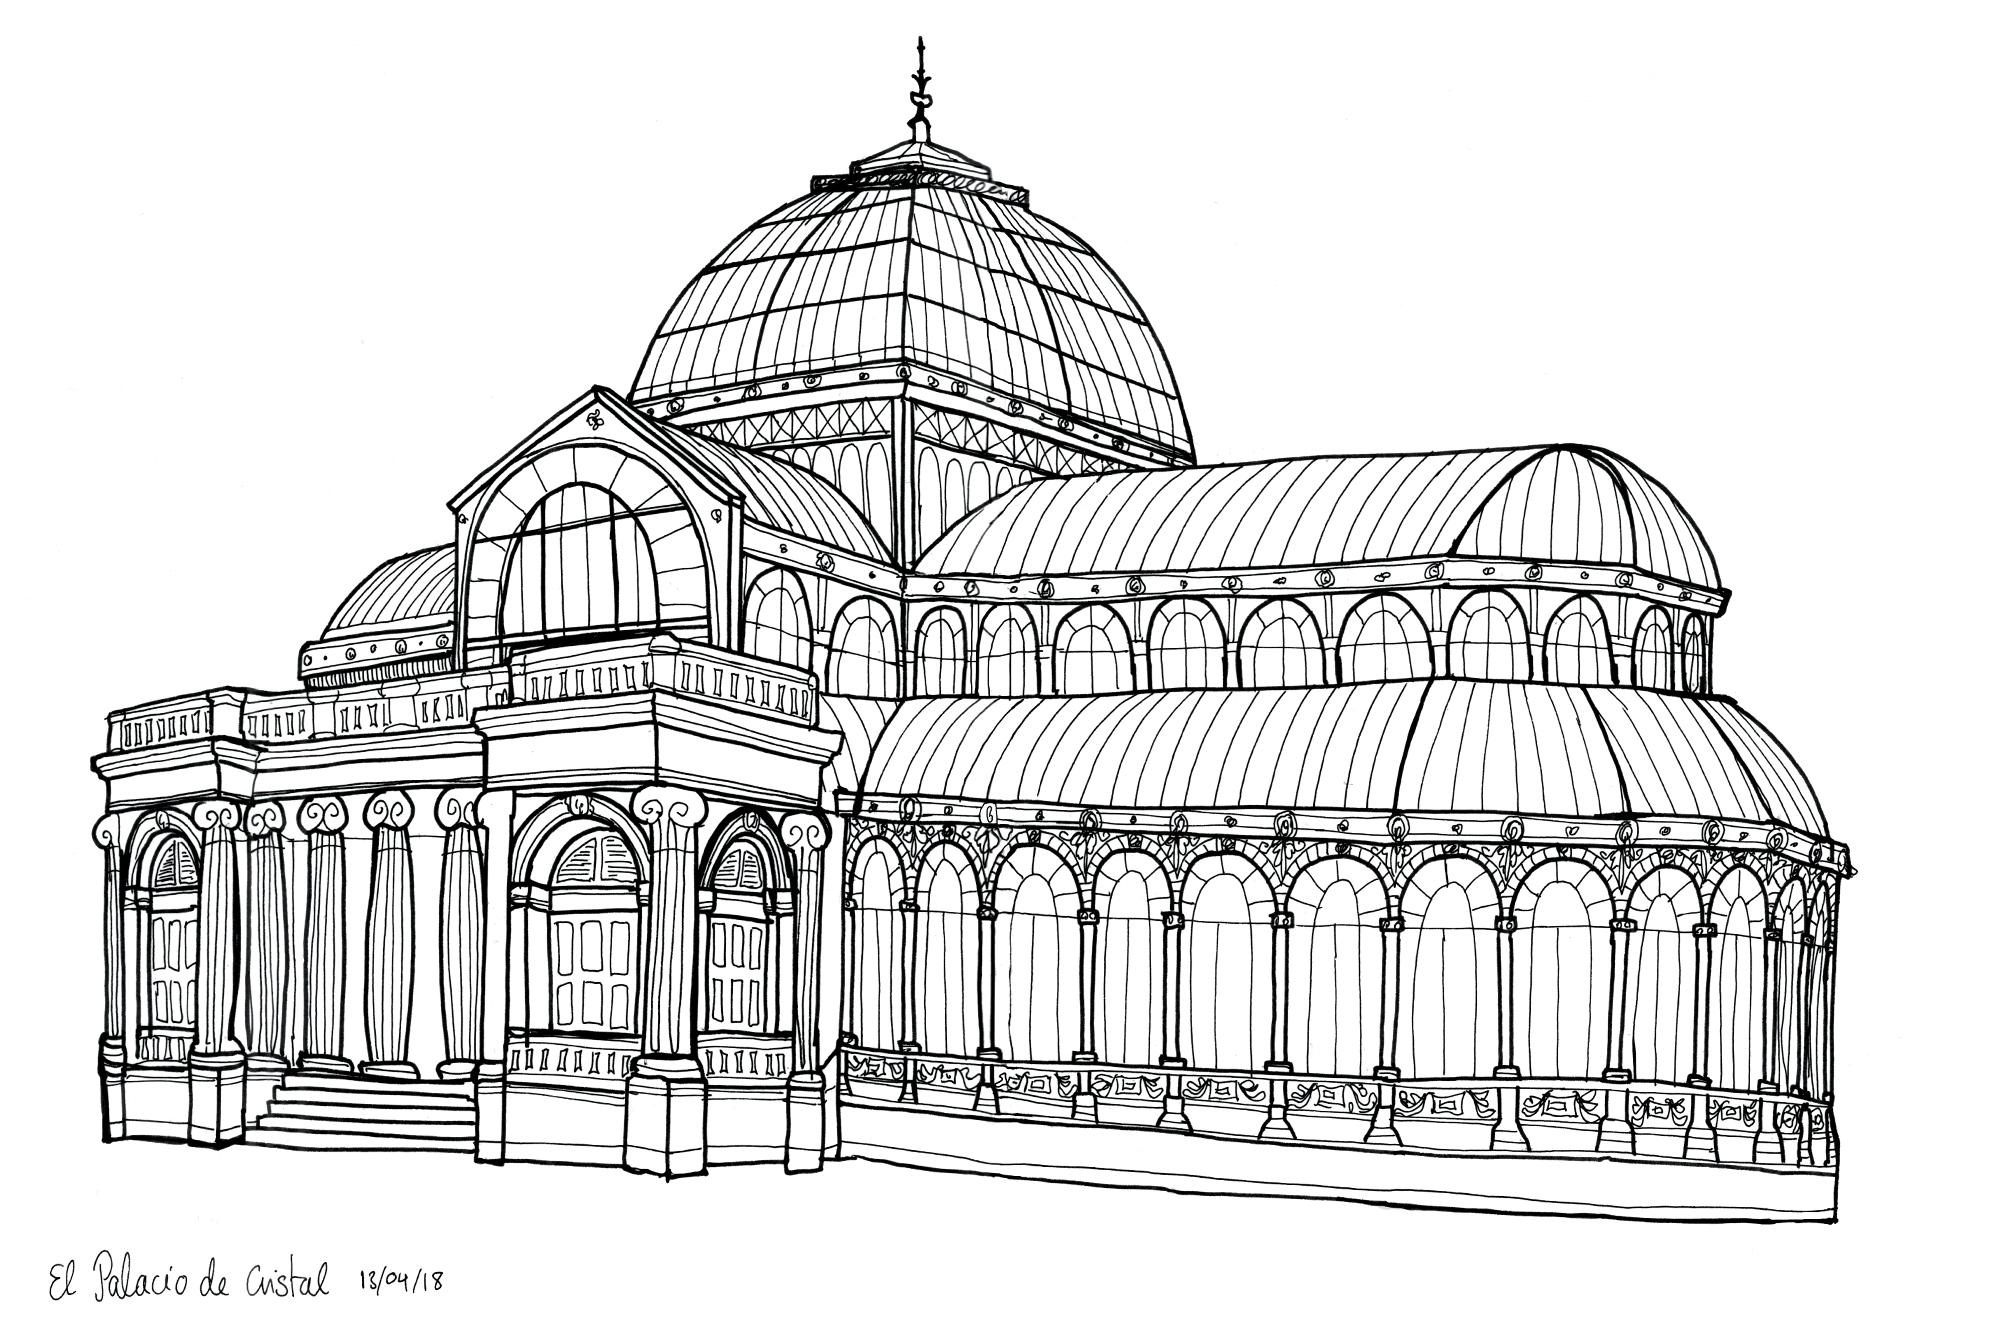 3_madrid_palacio-de-cristal_web.jpg